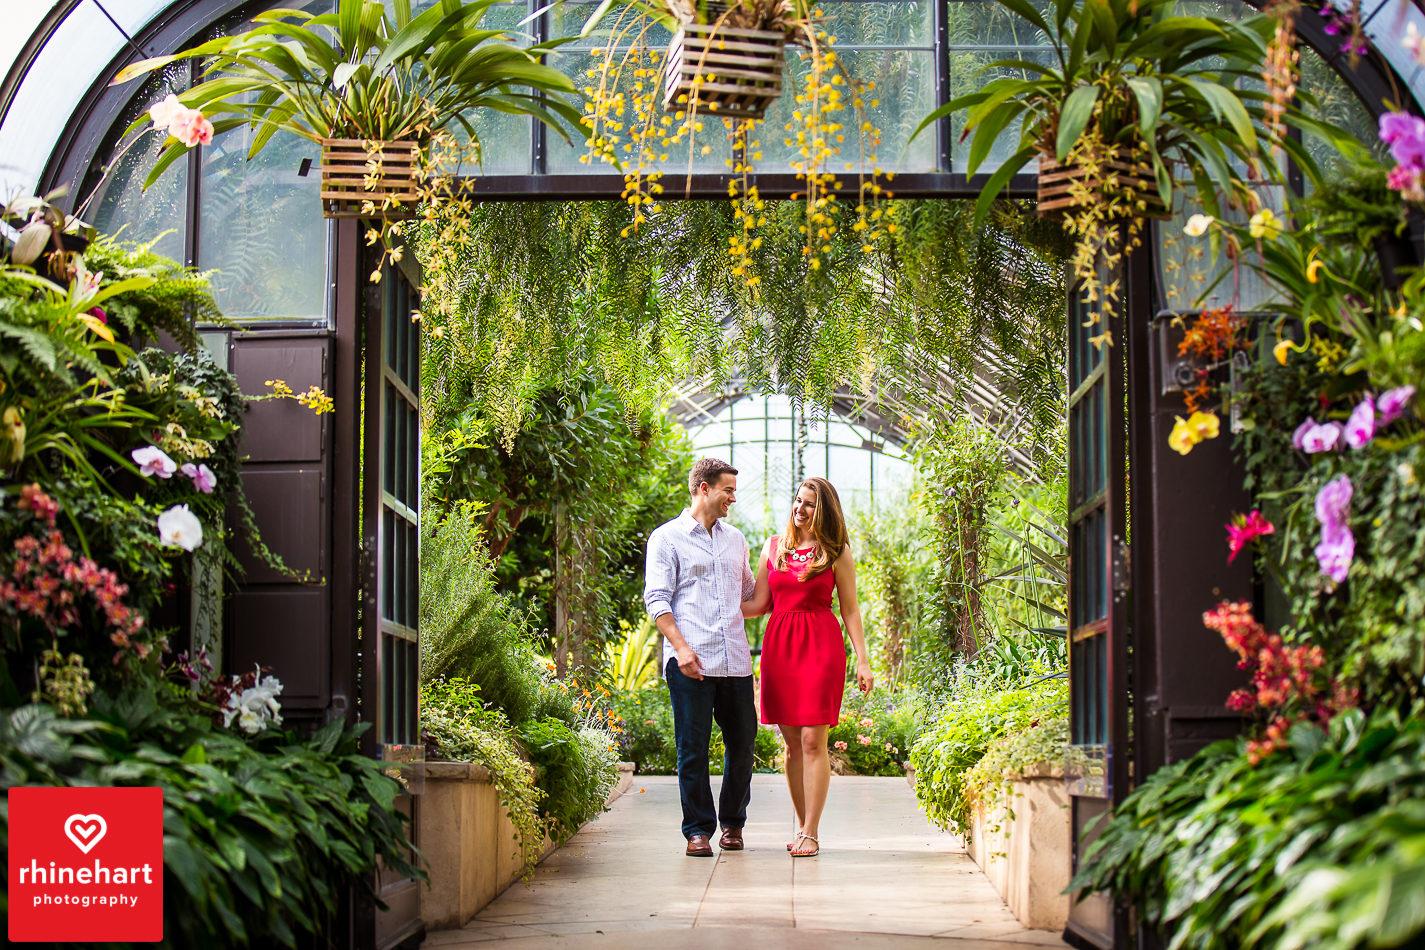 longwood-gardens-engagement-photographer-61